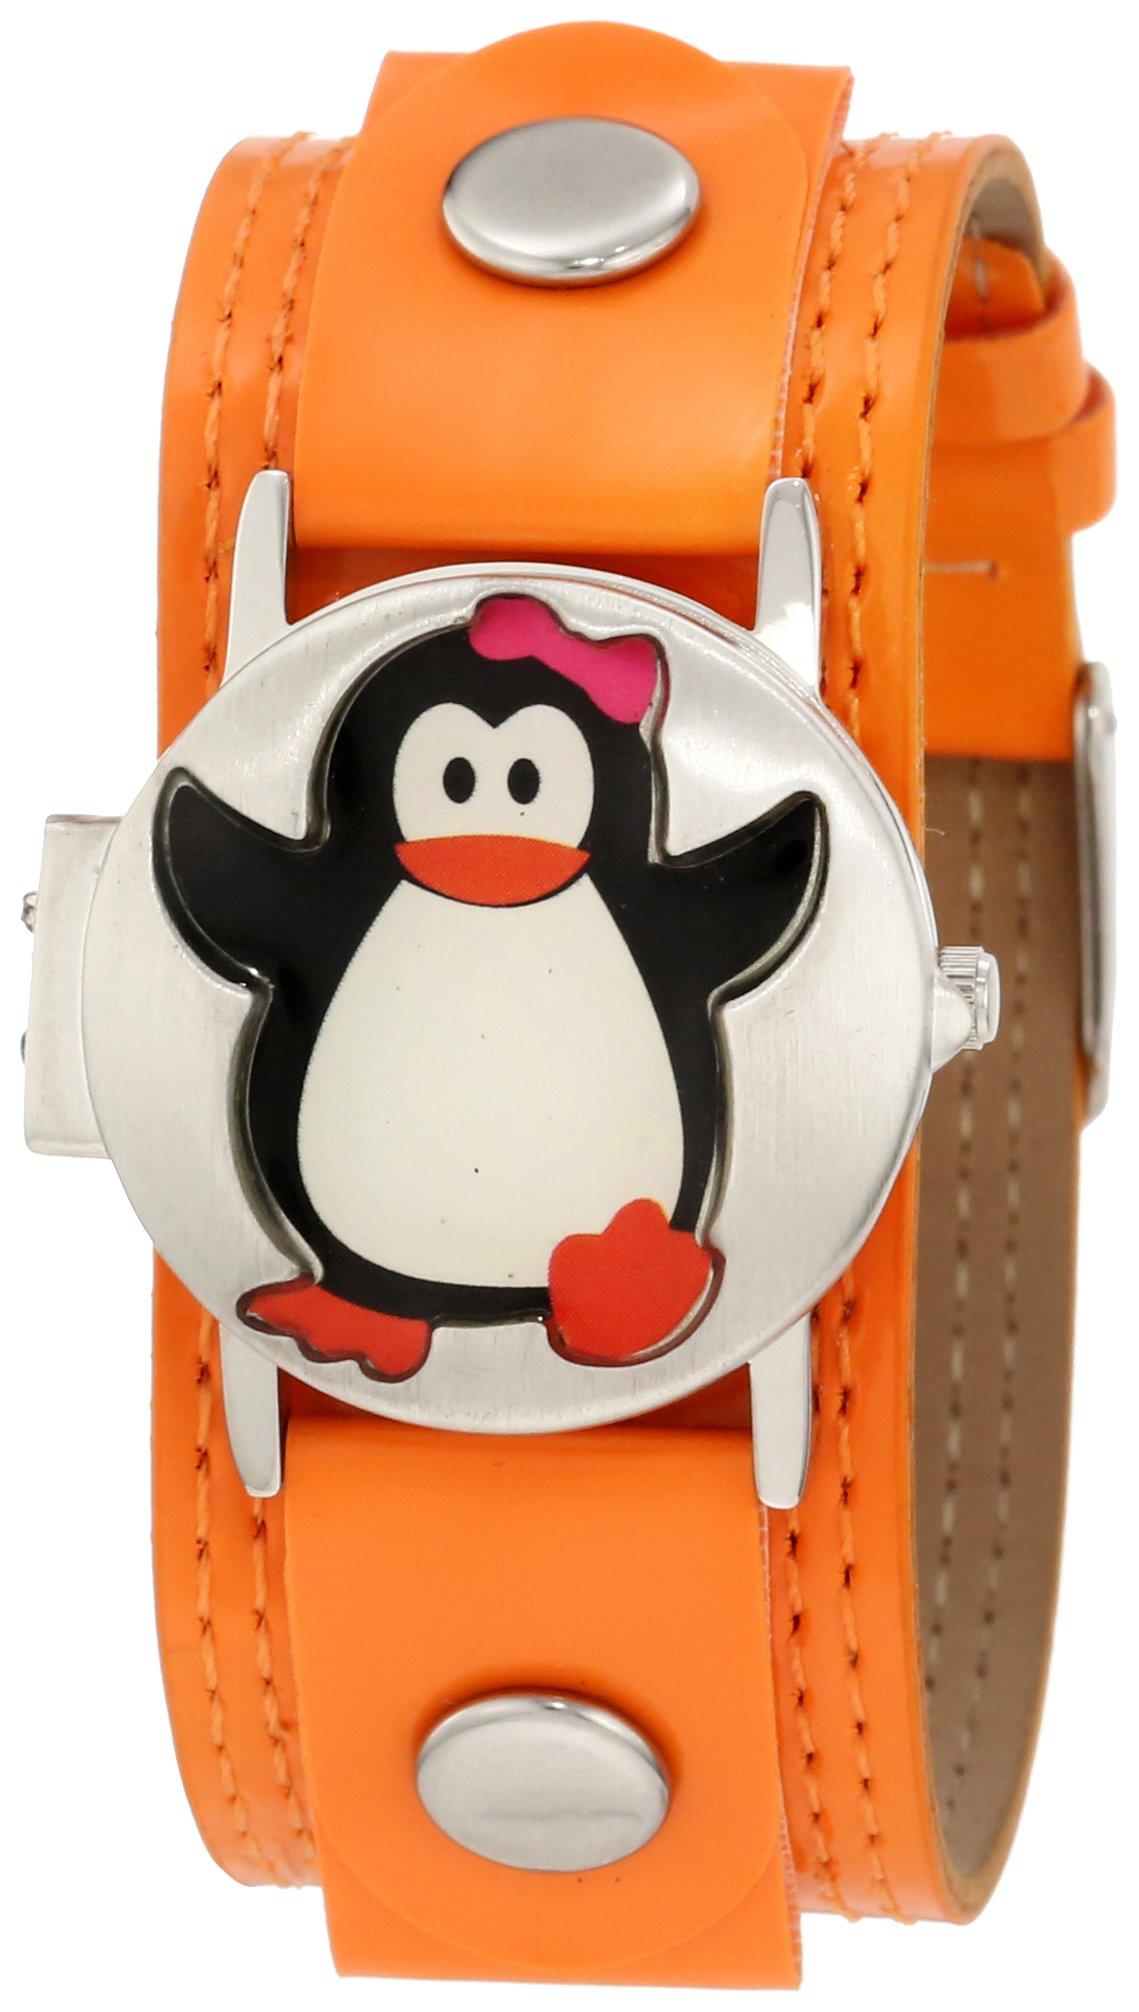 Frenzy Kids' FR319 Penguin Analog Watch with Orange Band